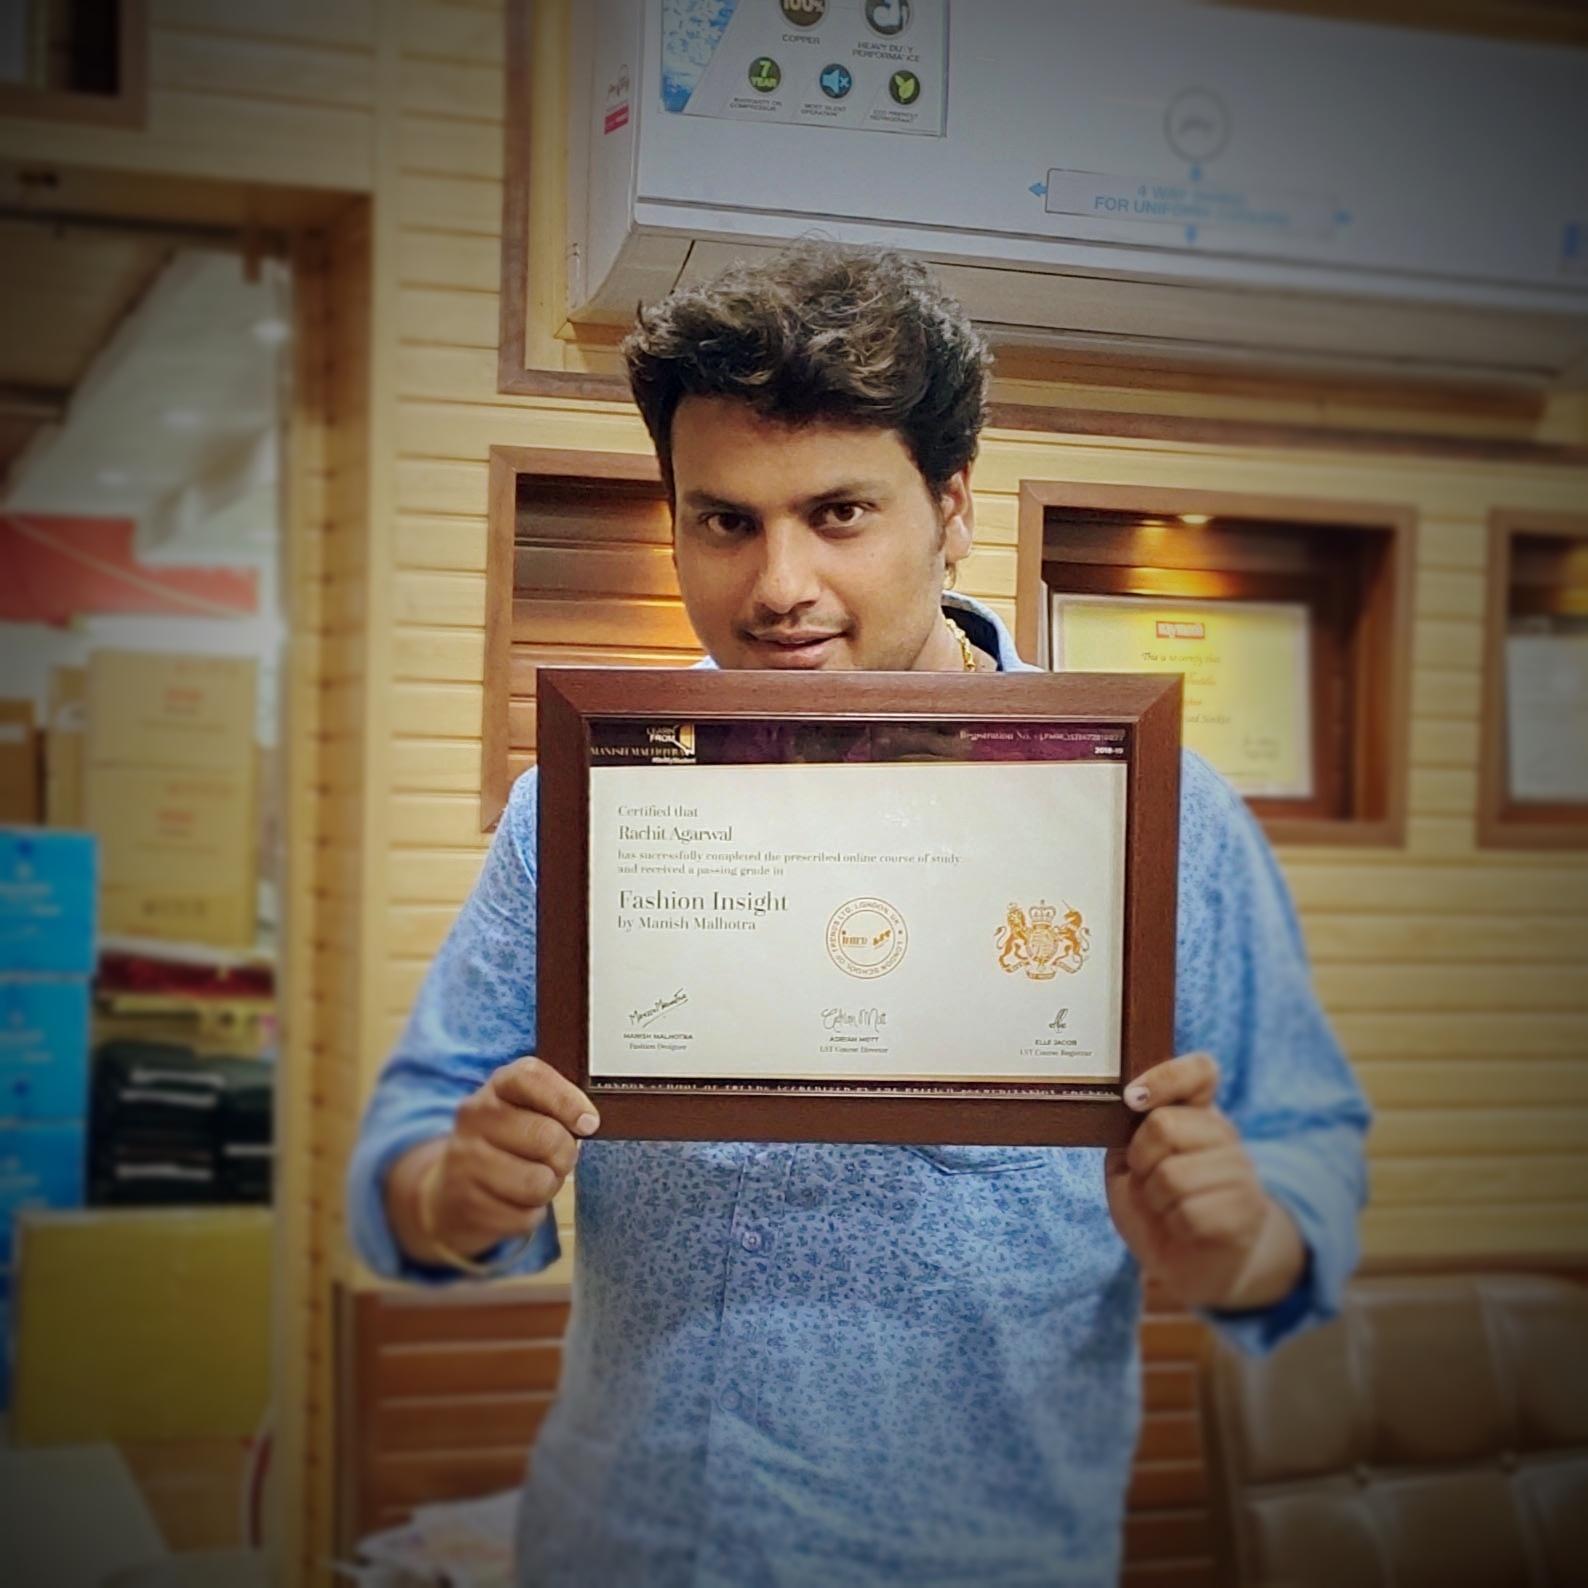 Fashion Blog By Rrachit Fashion Insight Certificate By Manish Malhotra